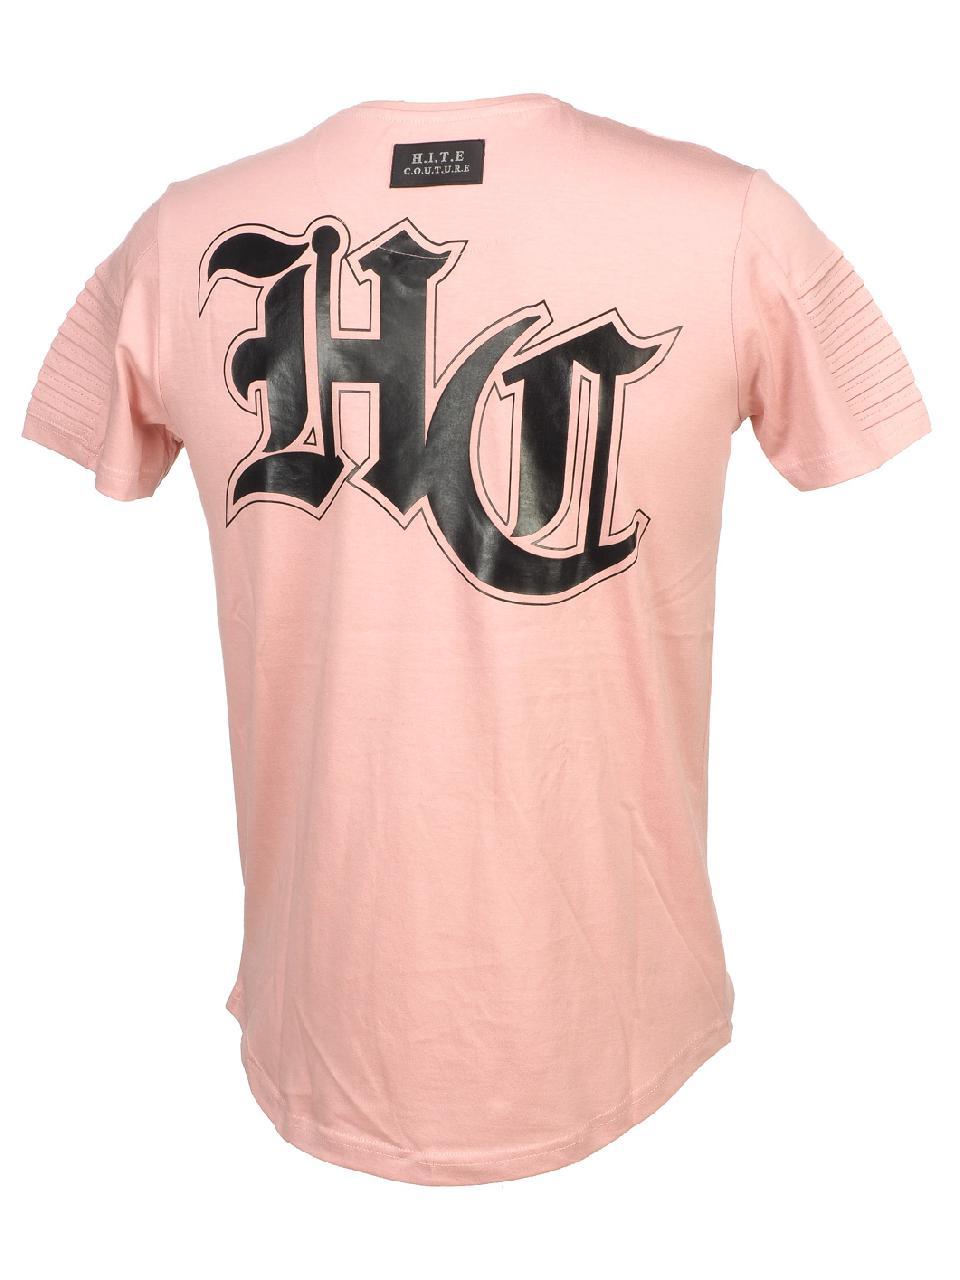 Short-Hite-Couture-Mafler-Pink-Mc-Tee-Pink-11529-New thumbnail 5